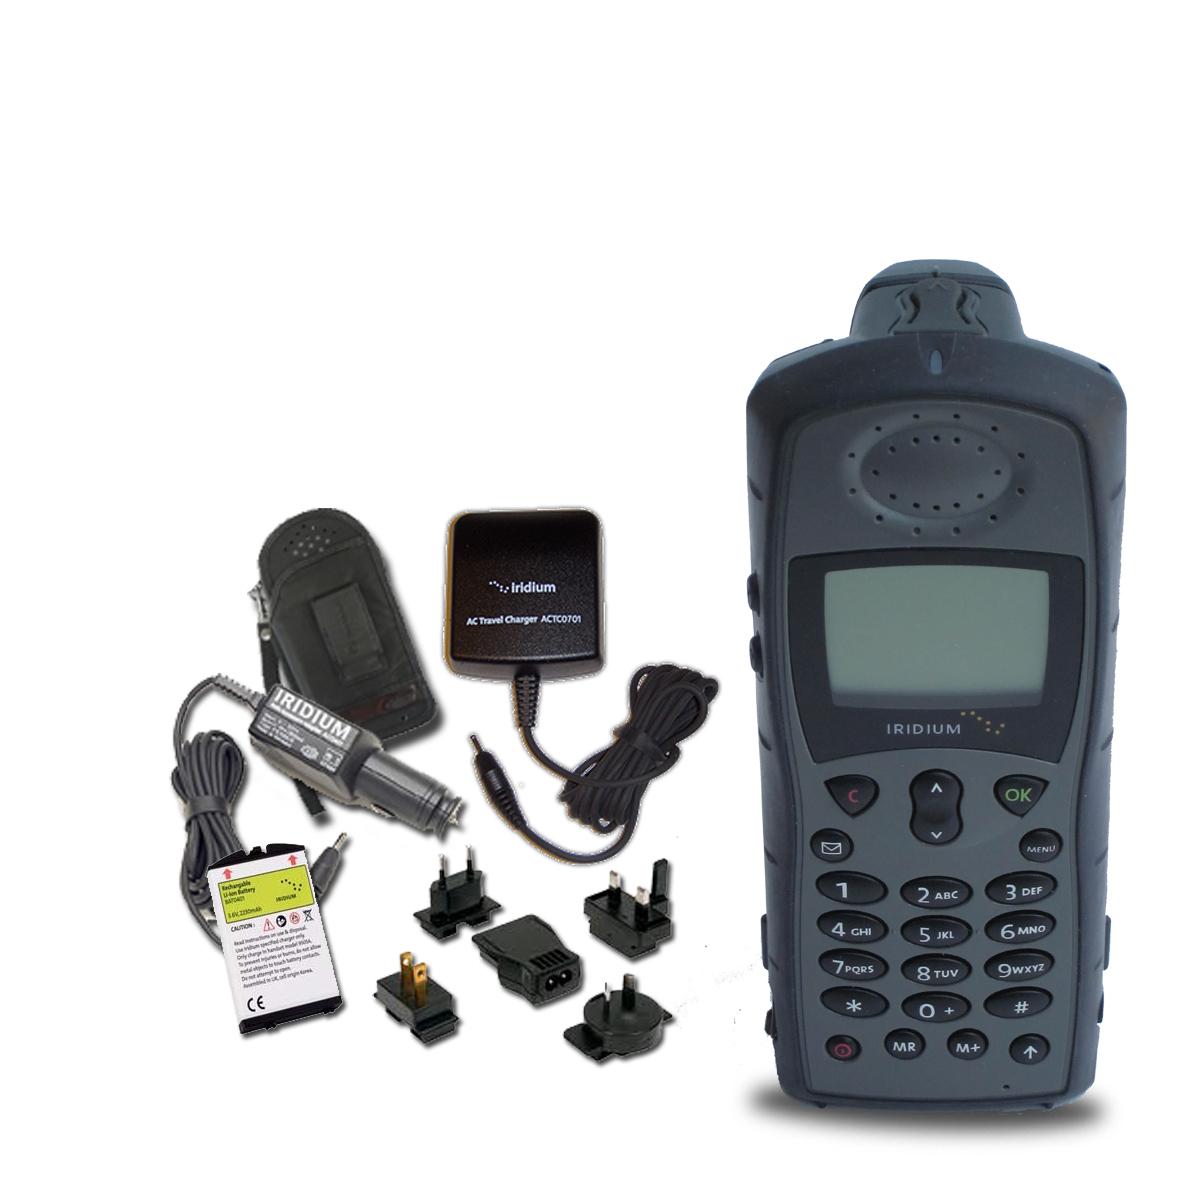 iridium-9505a-with-accesories.jpg